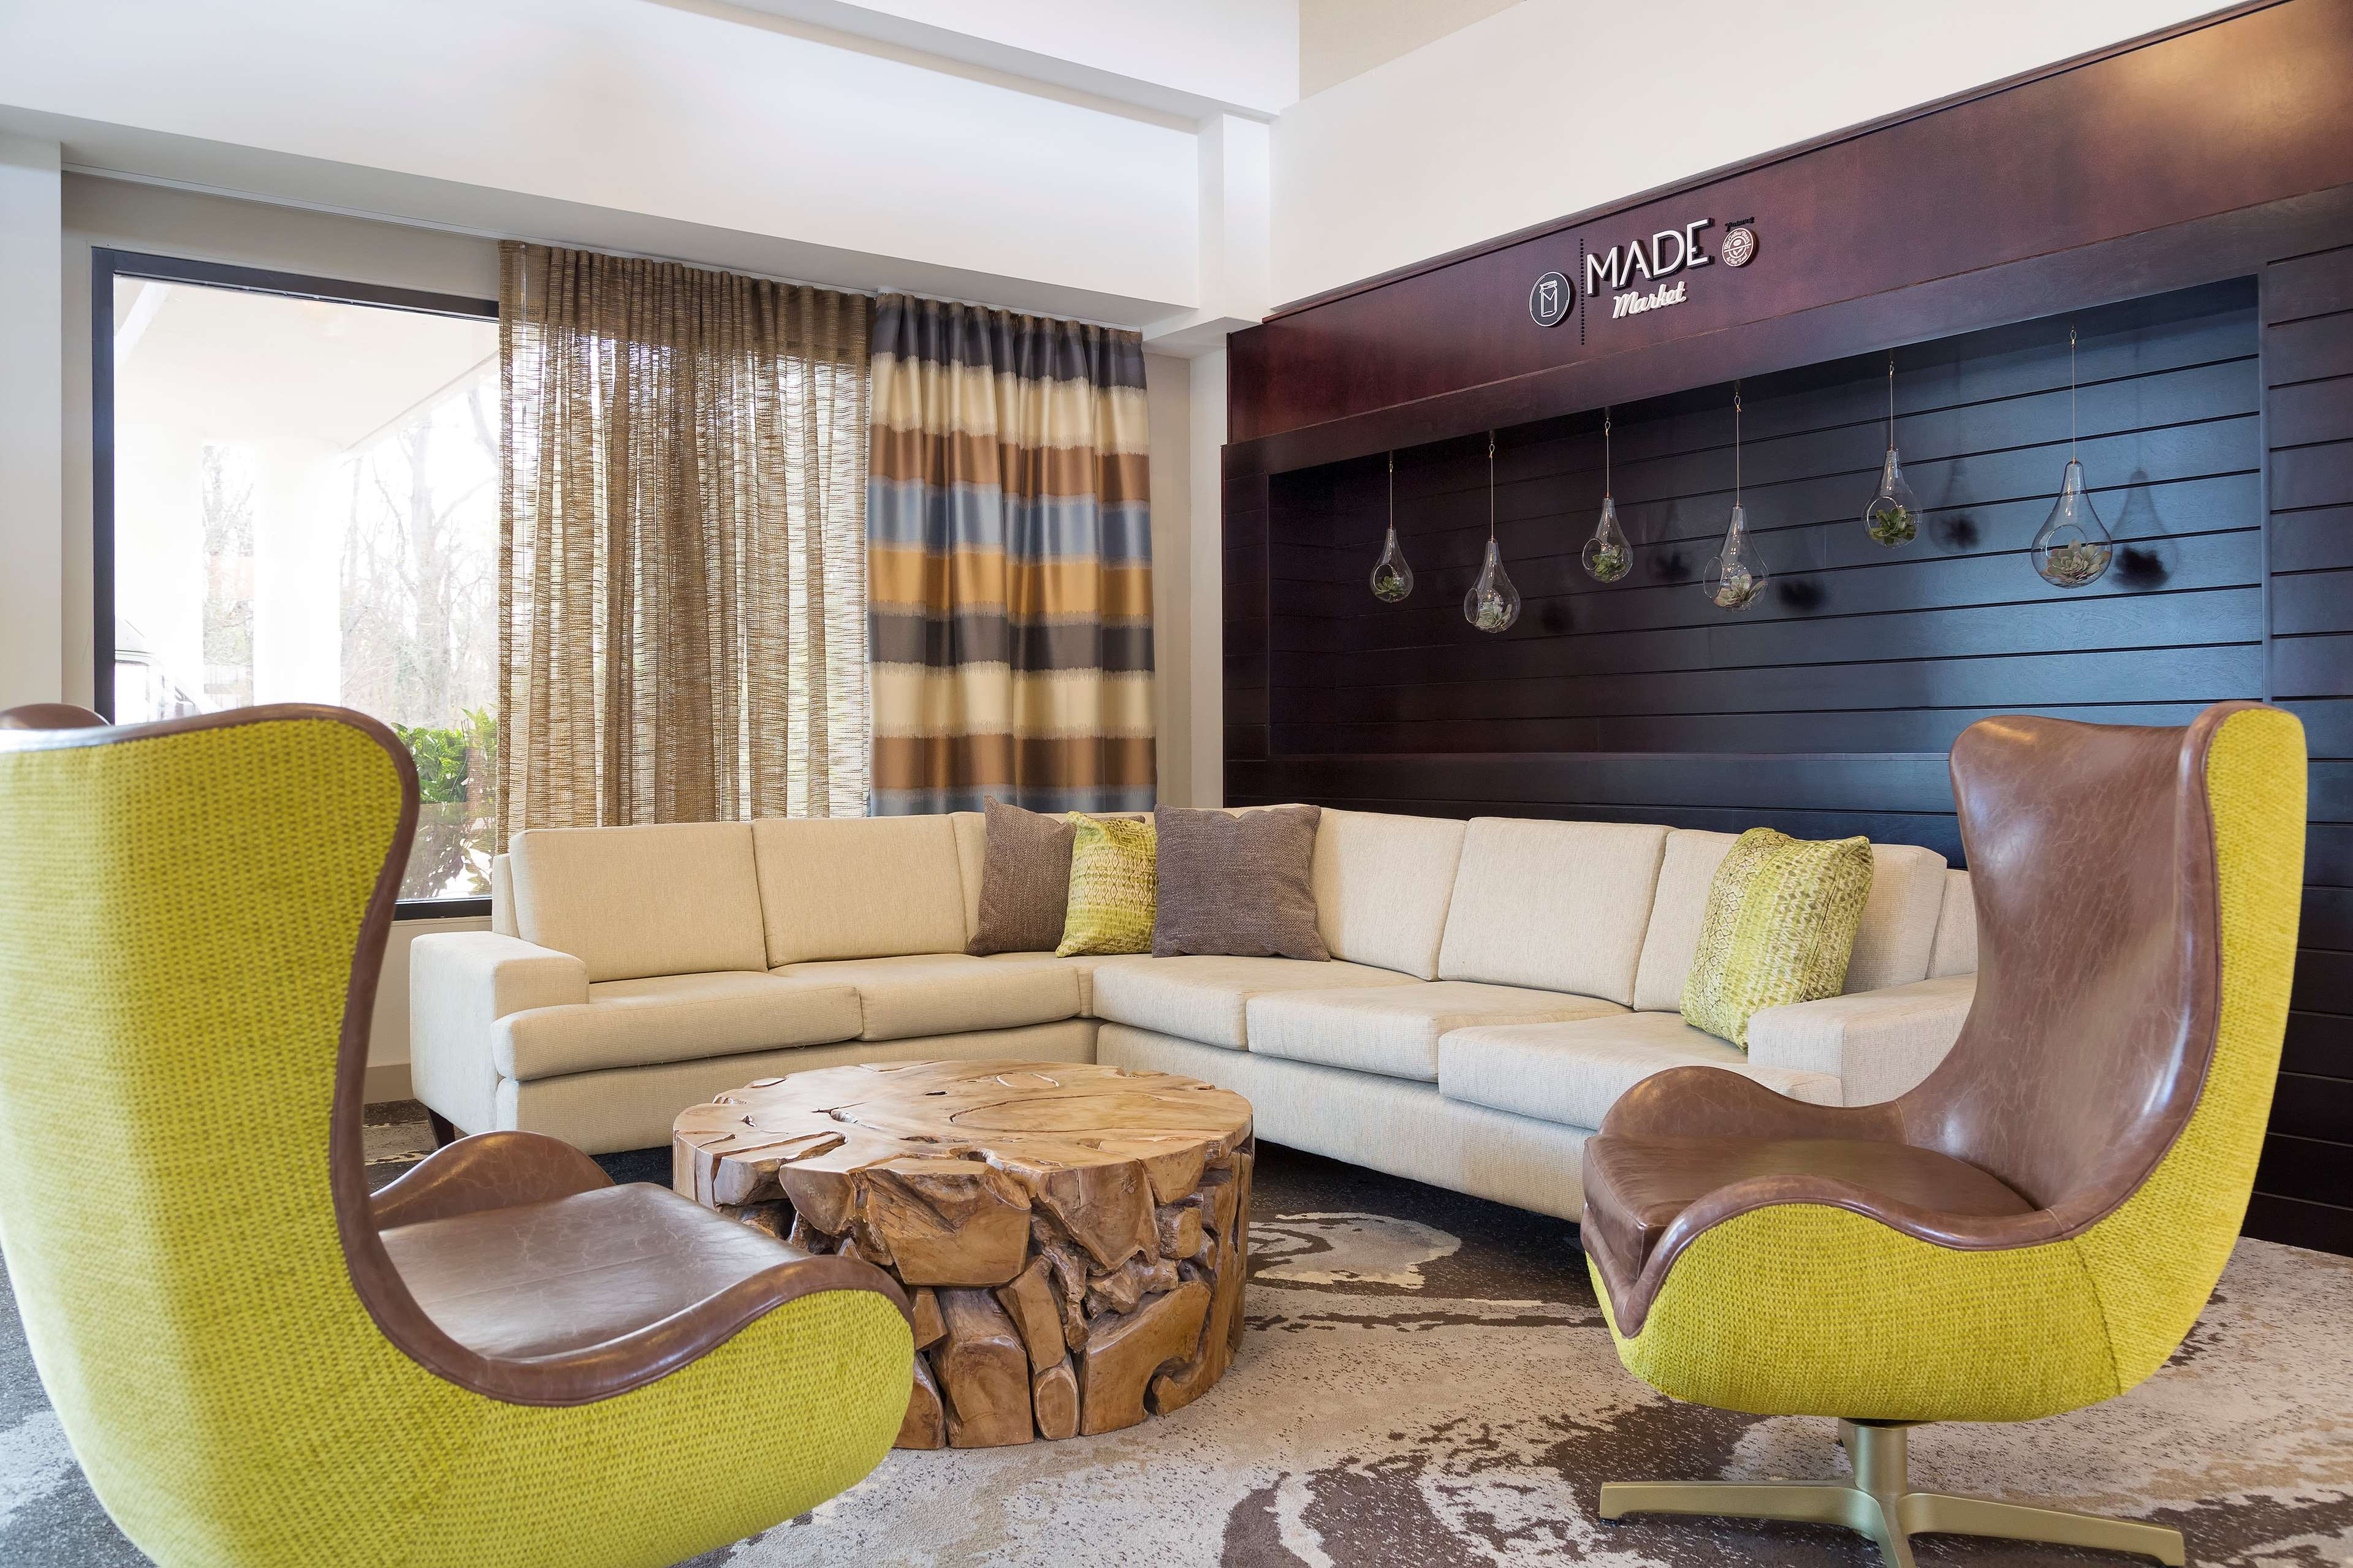 DoubleTree Suites by Hilton Hotel Nashville Airport image 5